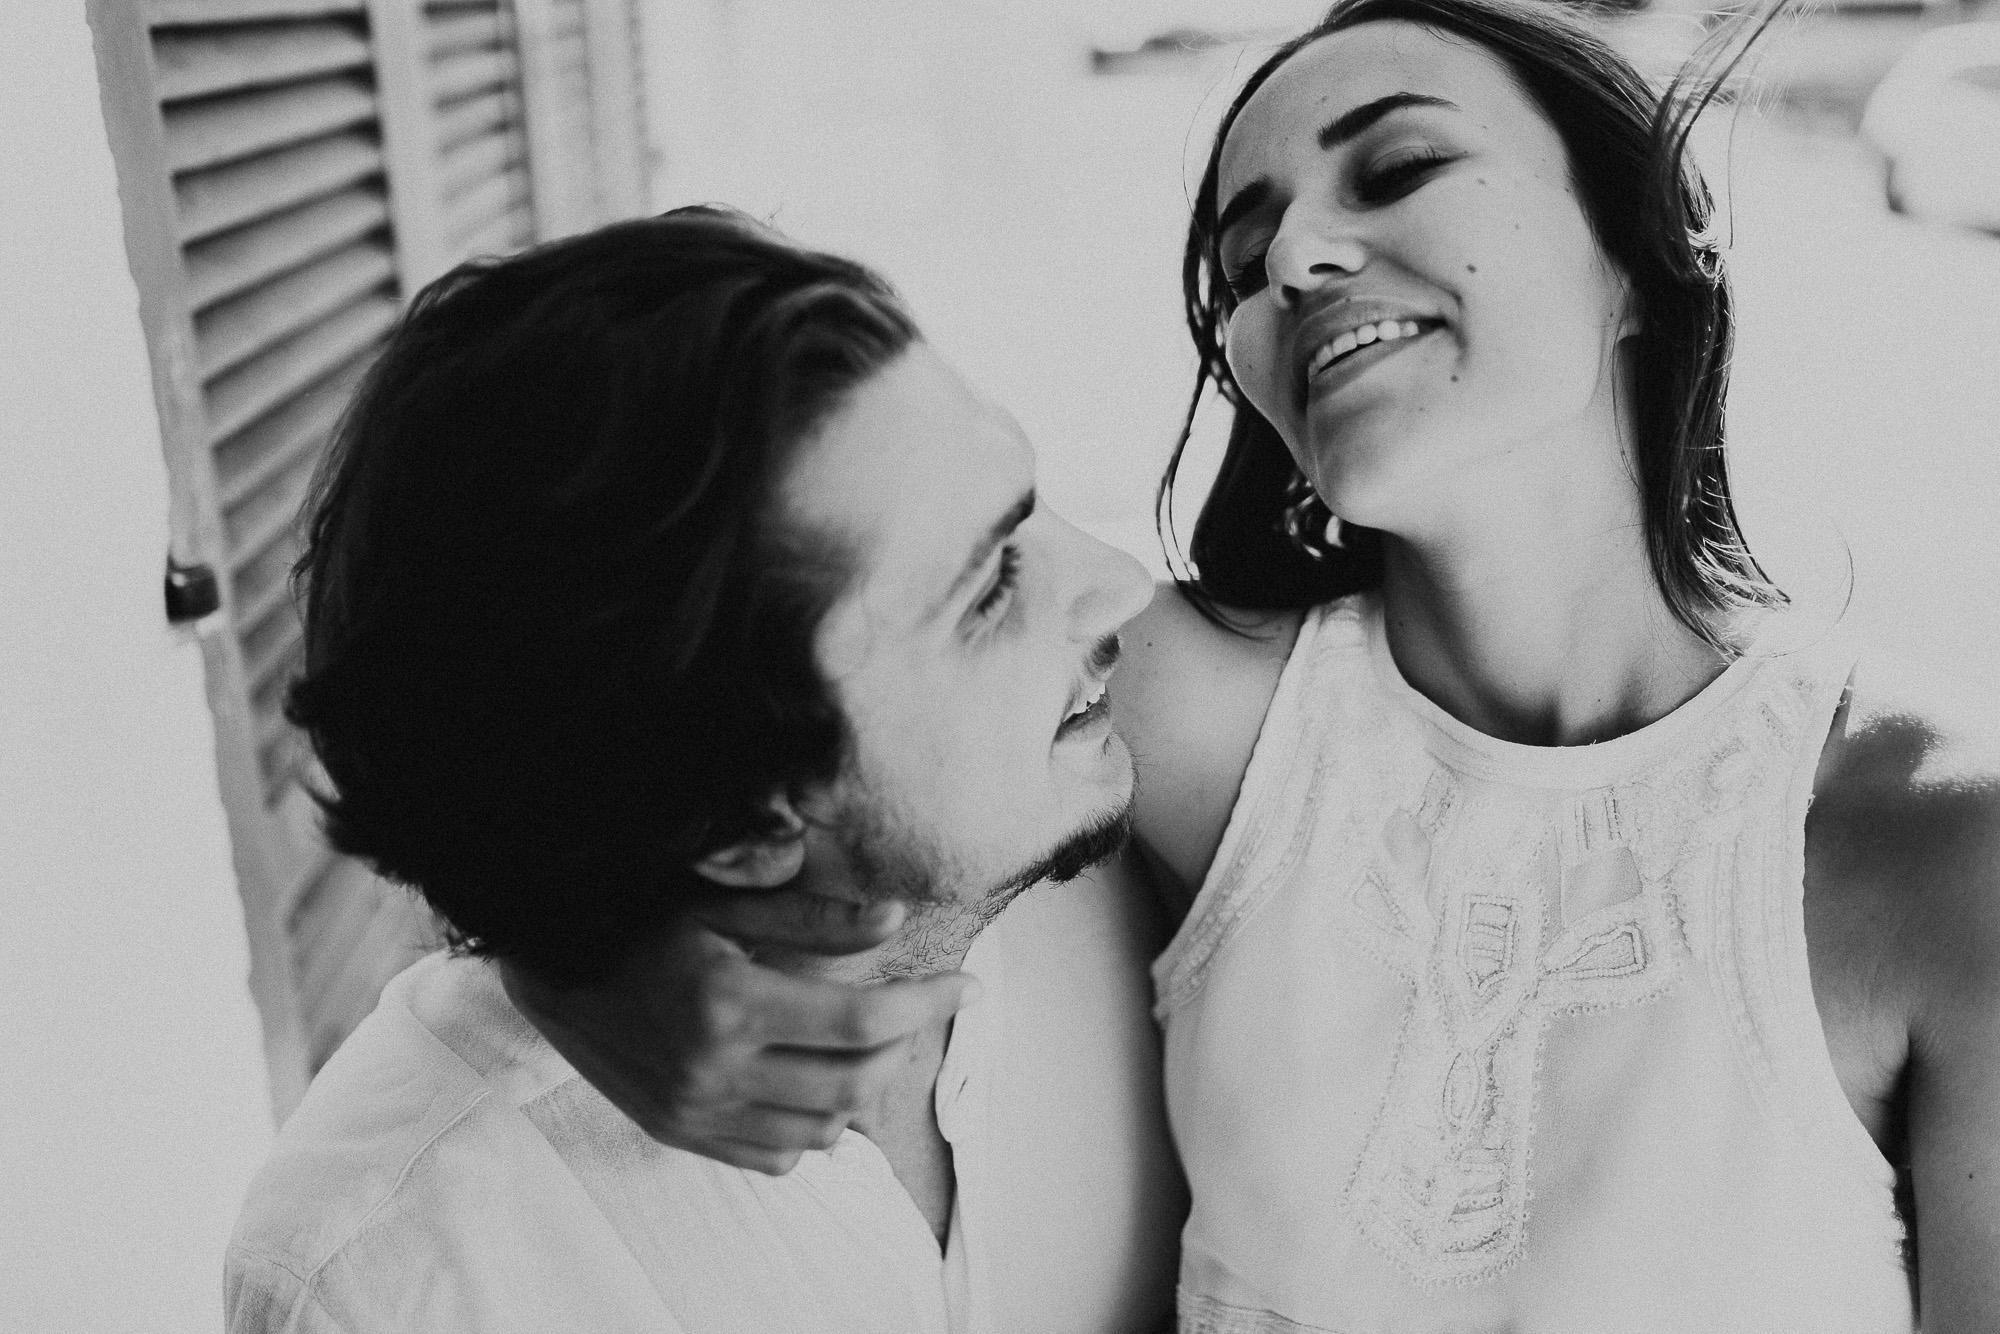 DanielaMarquardtPhotography_wedding_elopement_mallorca_spain_stjordi_sessalines_marinaandxavi430